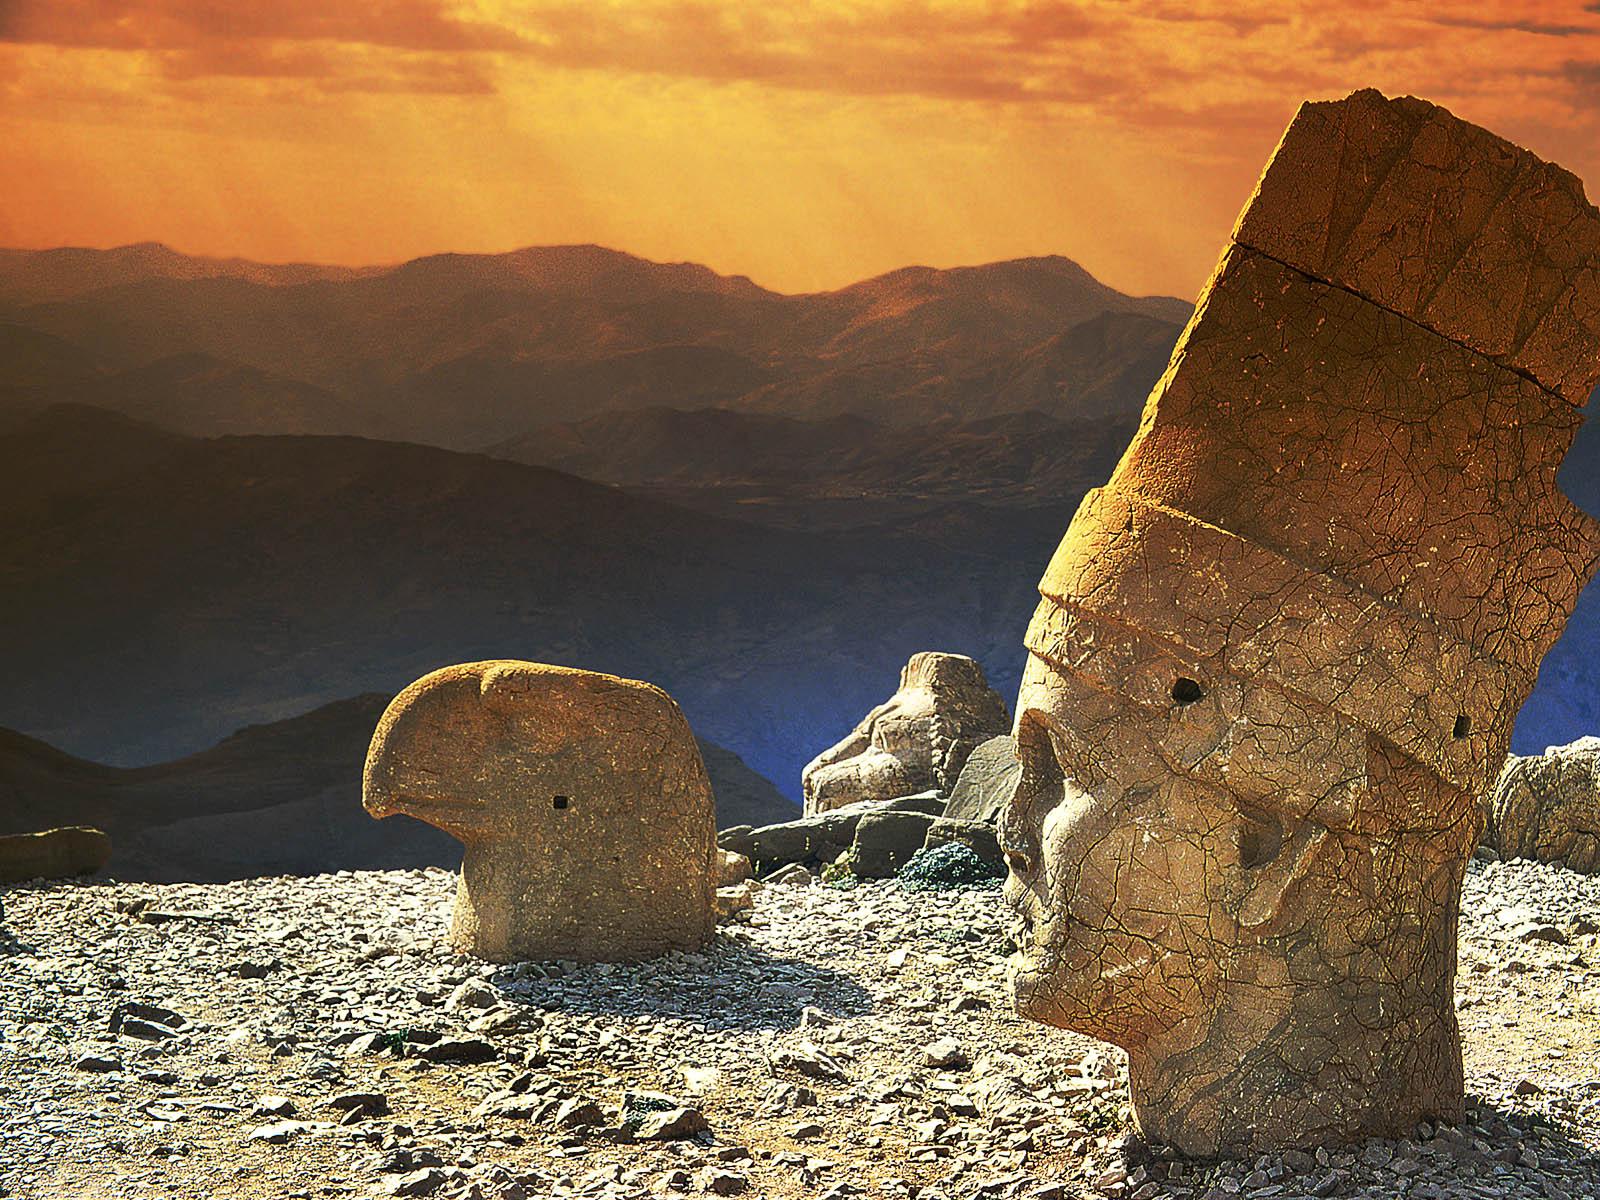 Muntele Nemrut, Turcia